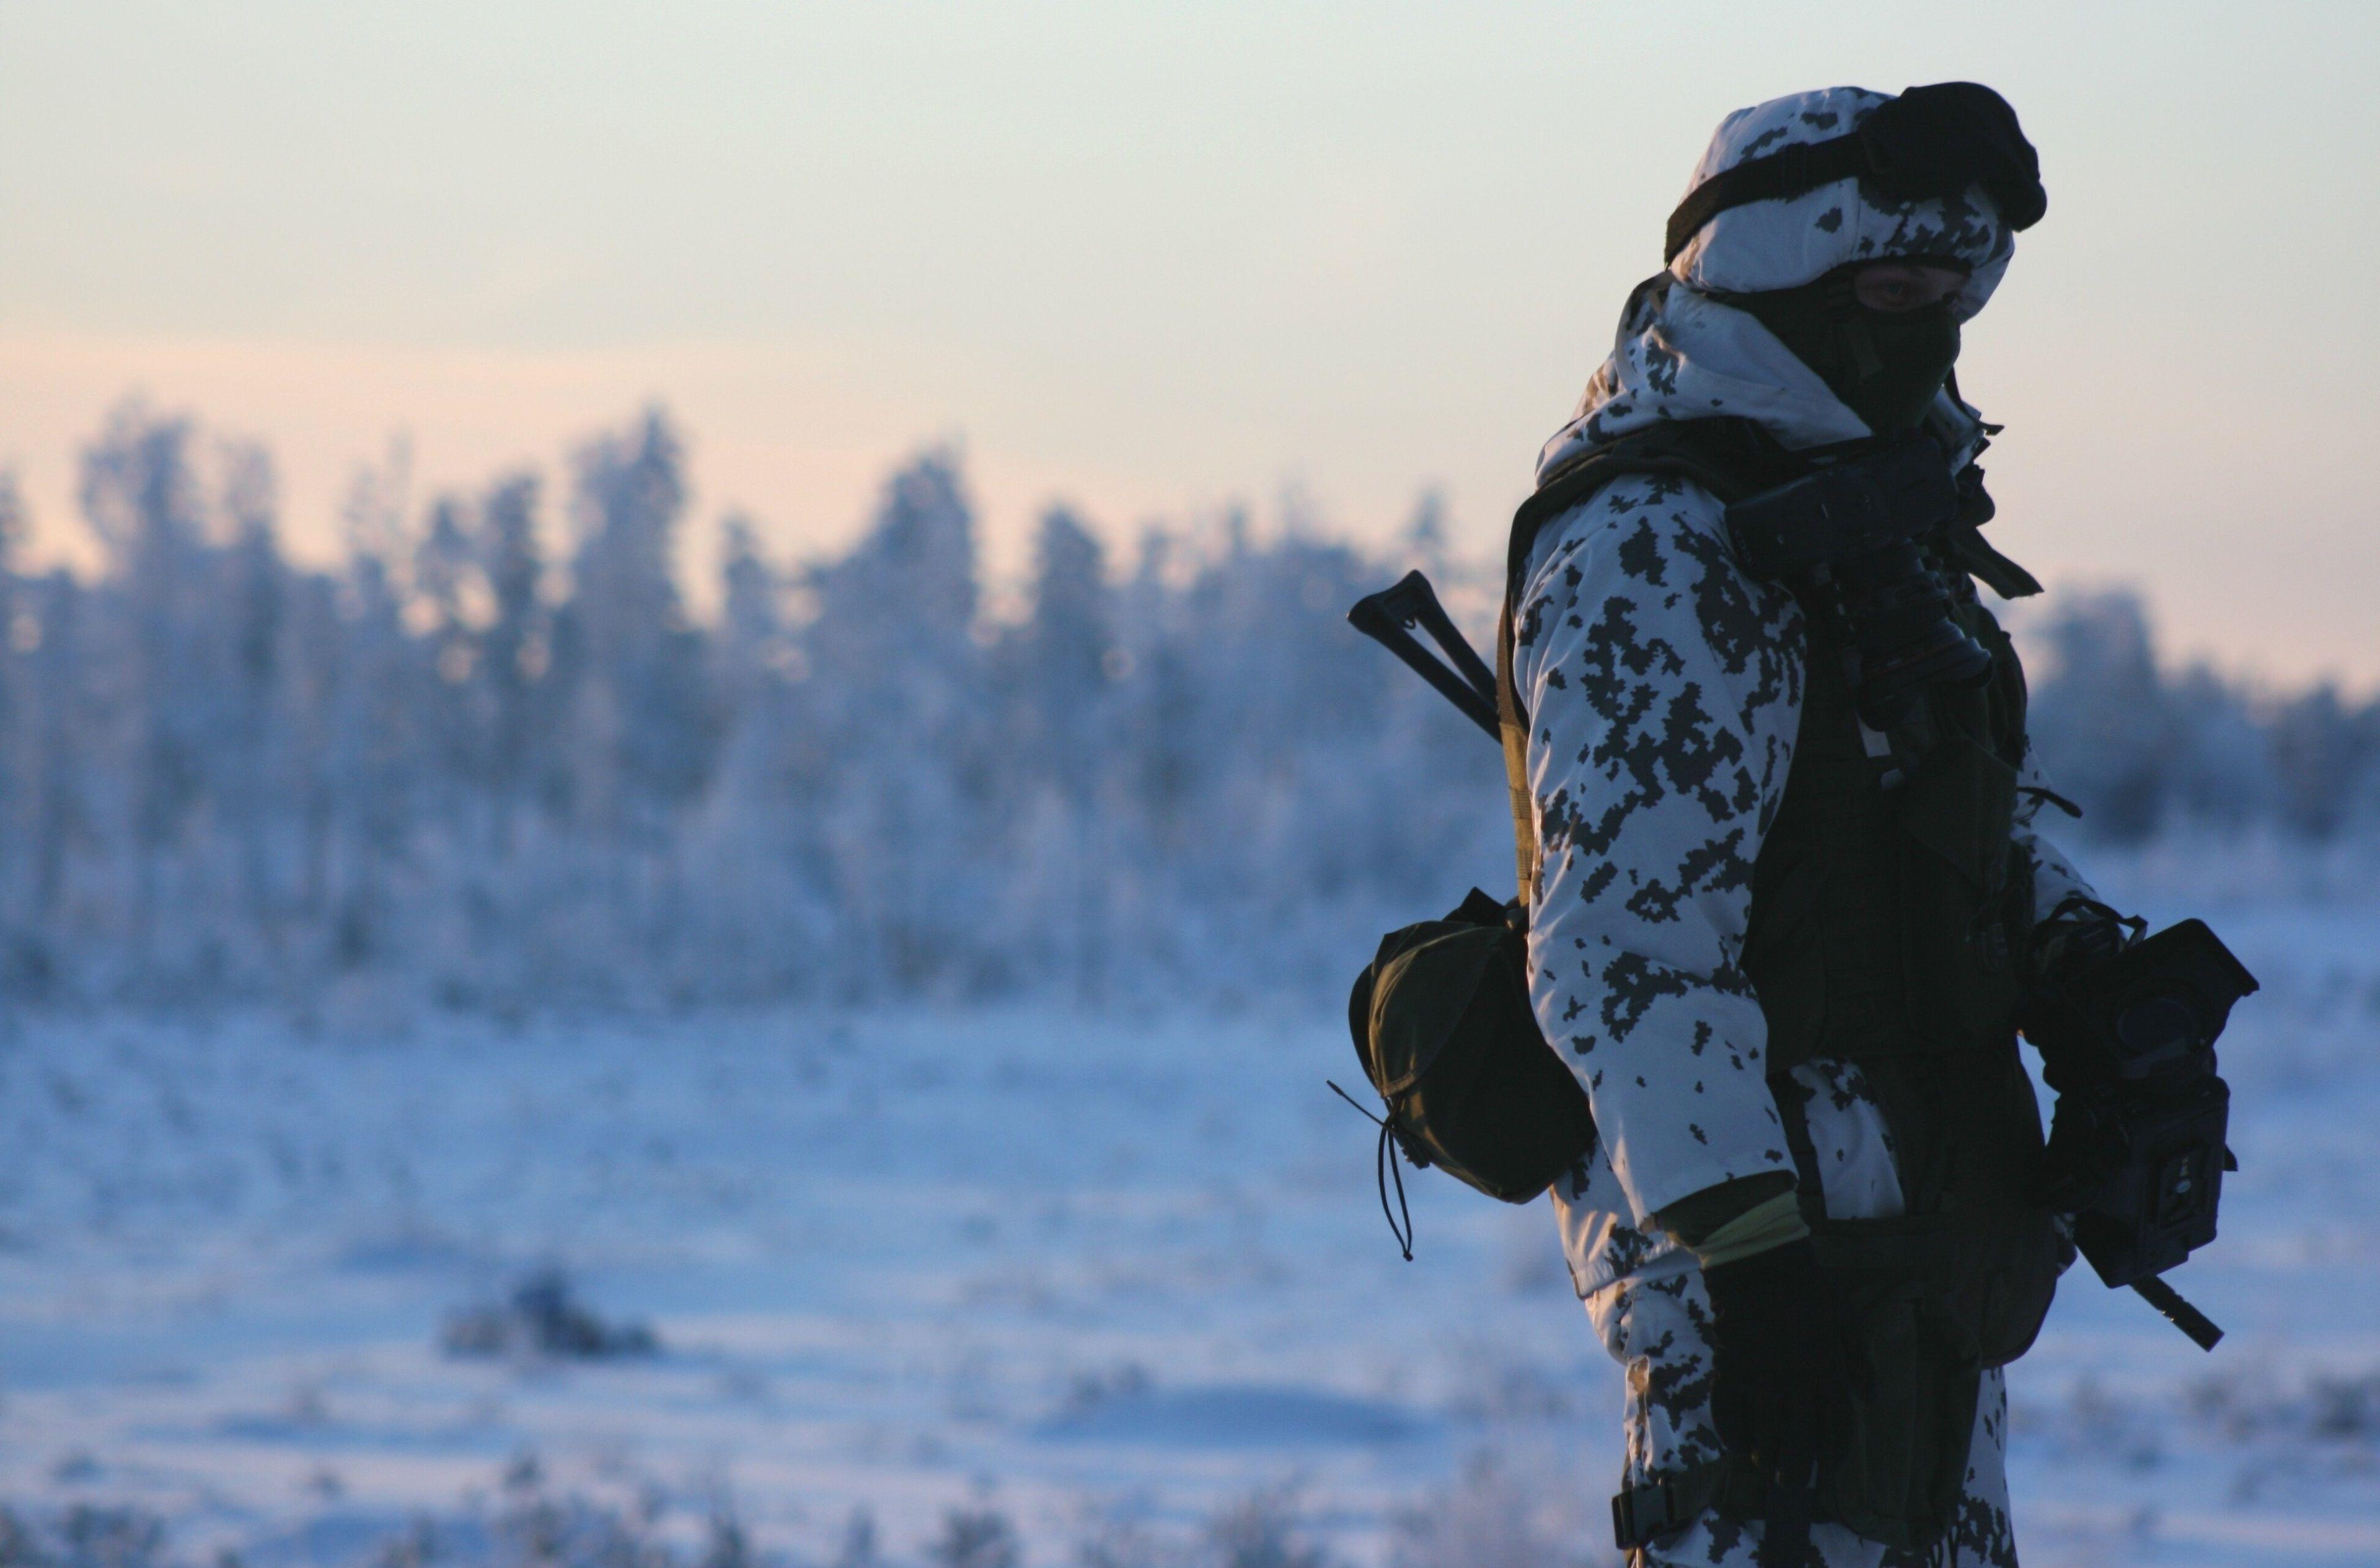 3840x2530 Russian Armed Forces 4k Wallpaper Downloard Soldier